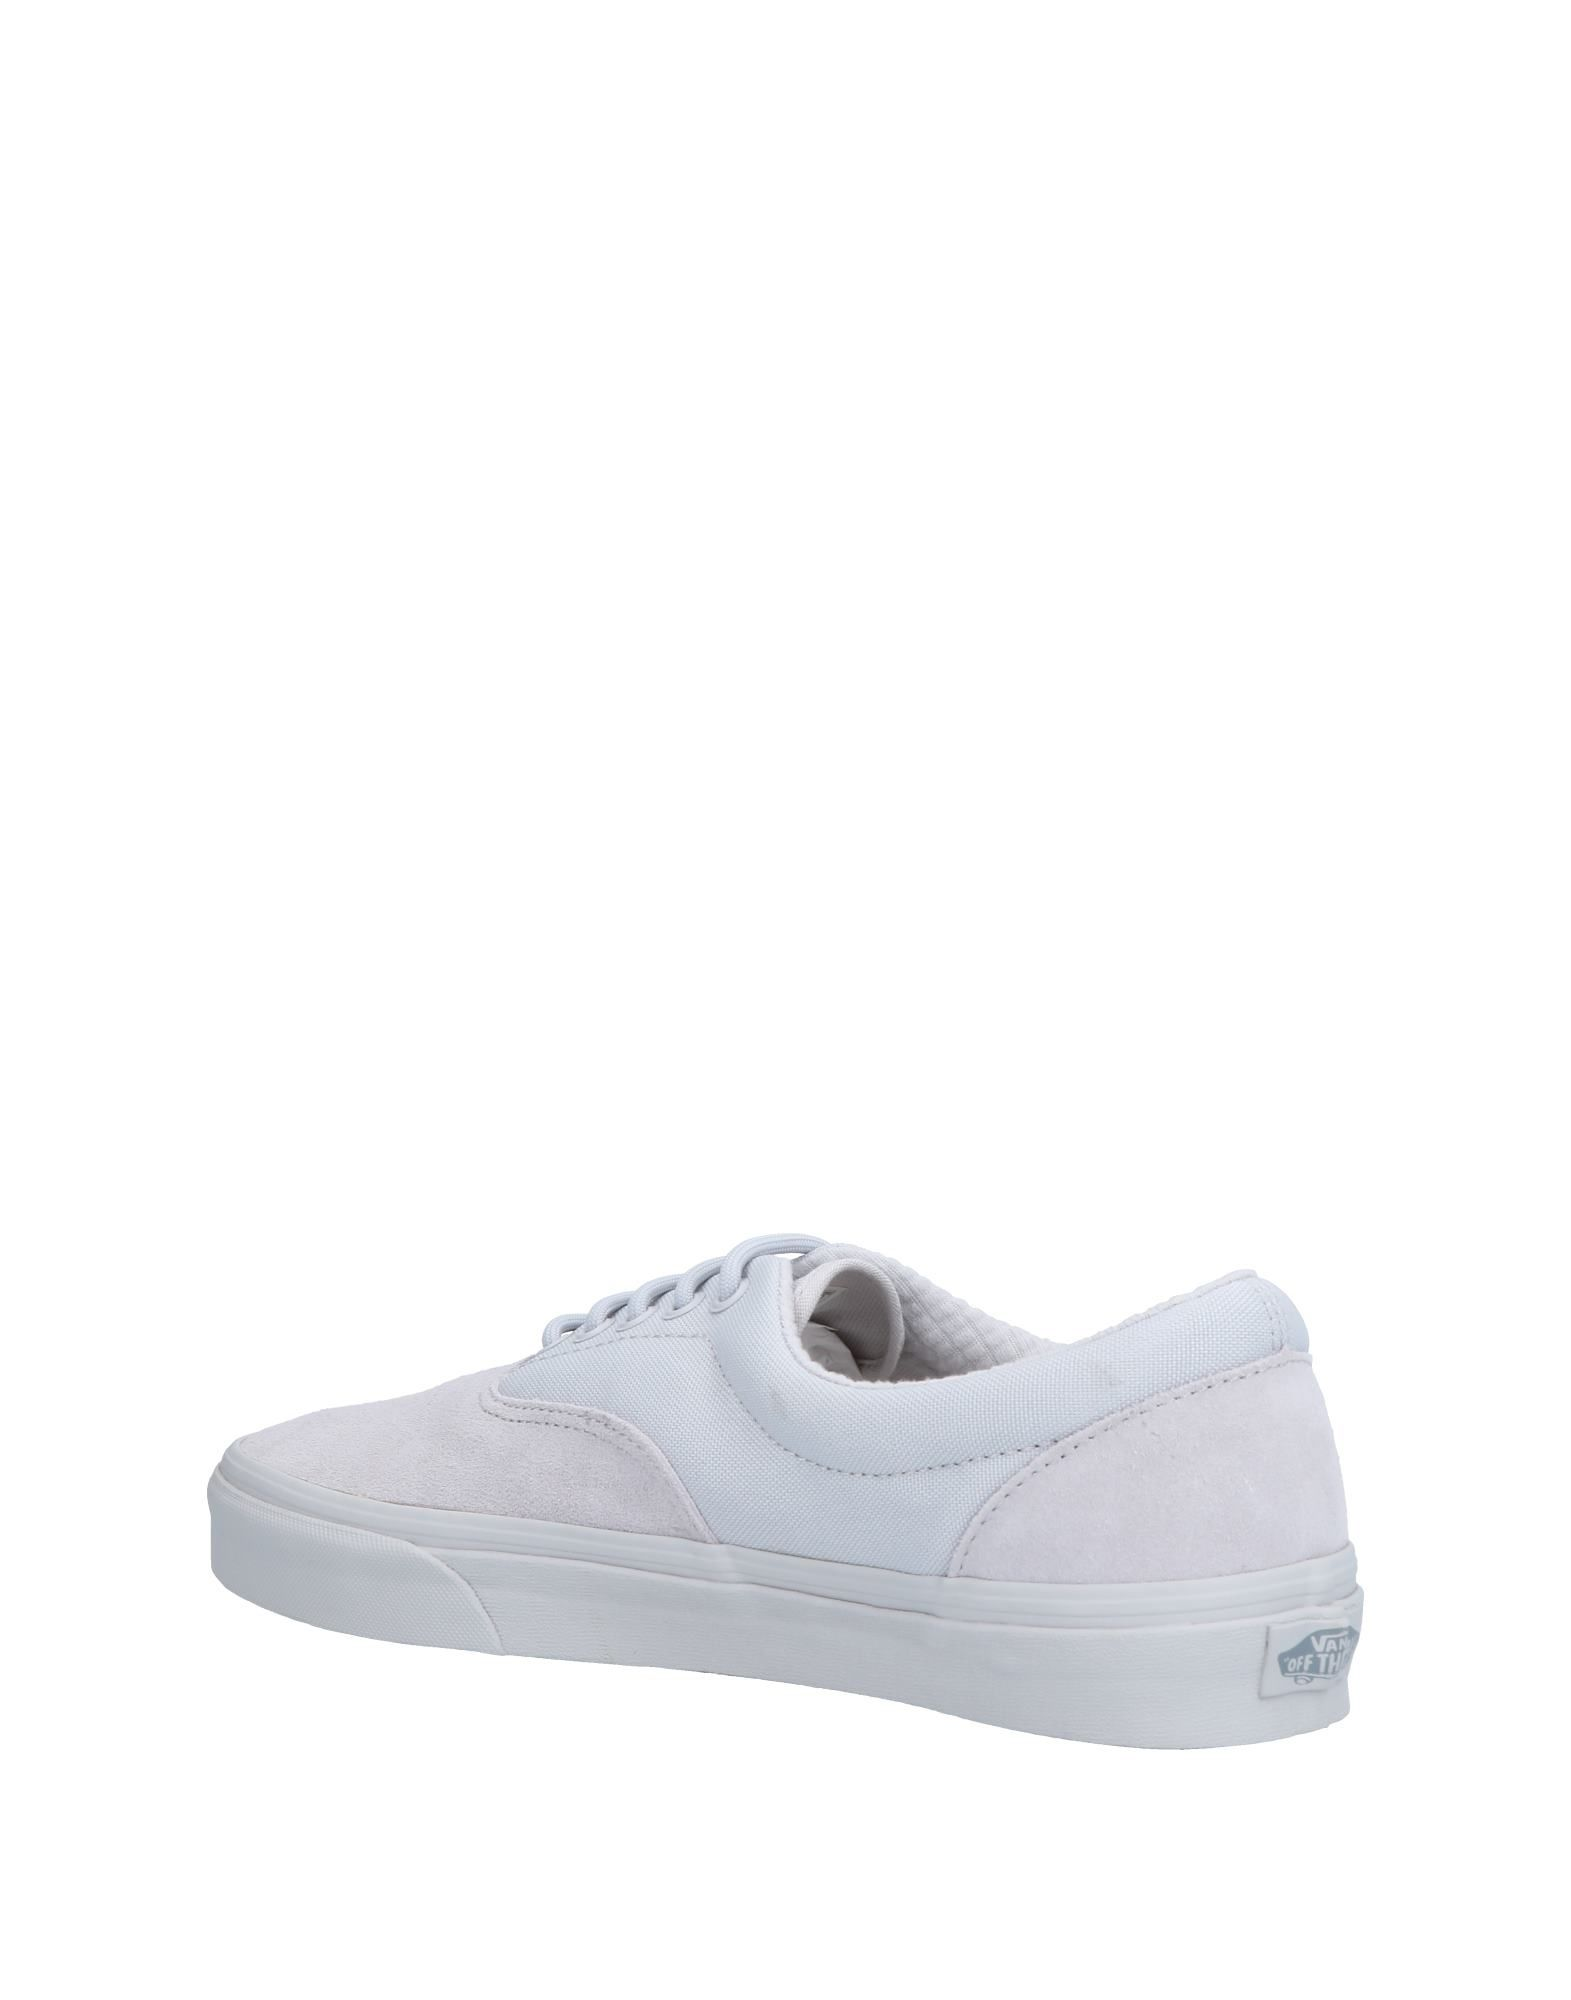 Vans Sneakers Herren  11492498QP Heiße Schuhe 8a39e8